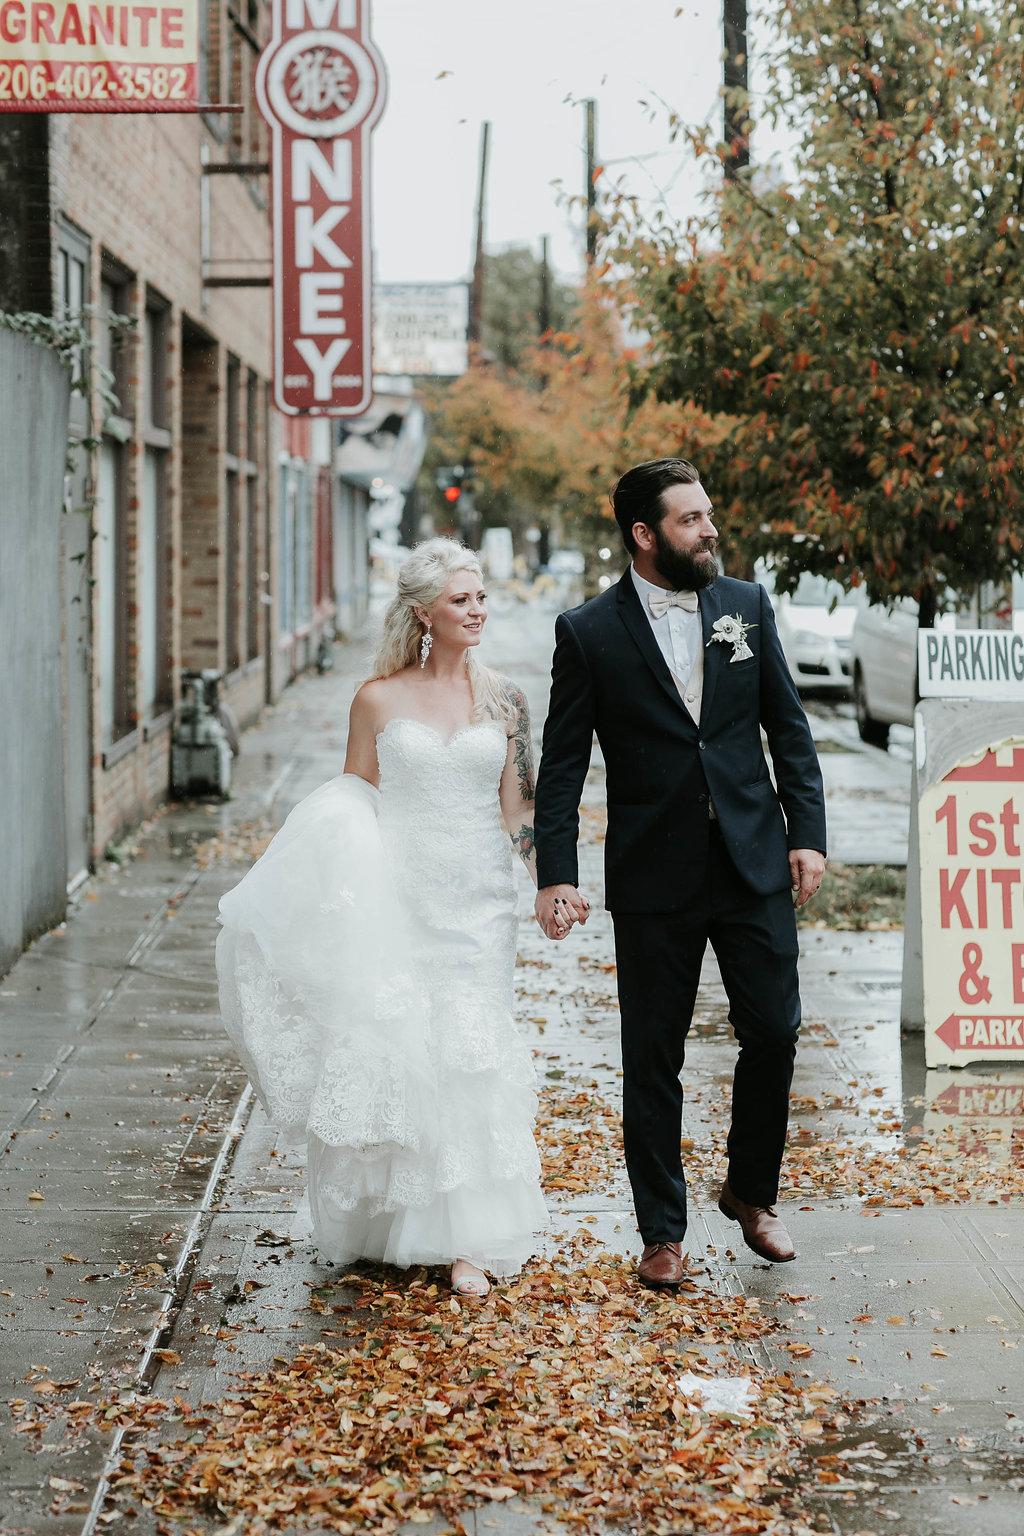 The_Big_Fake_wedding_Seattle_Within_sodo_wedding_by_Adina_Preston_Weddings_118.JPG